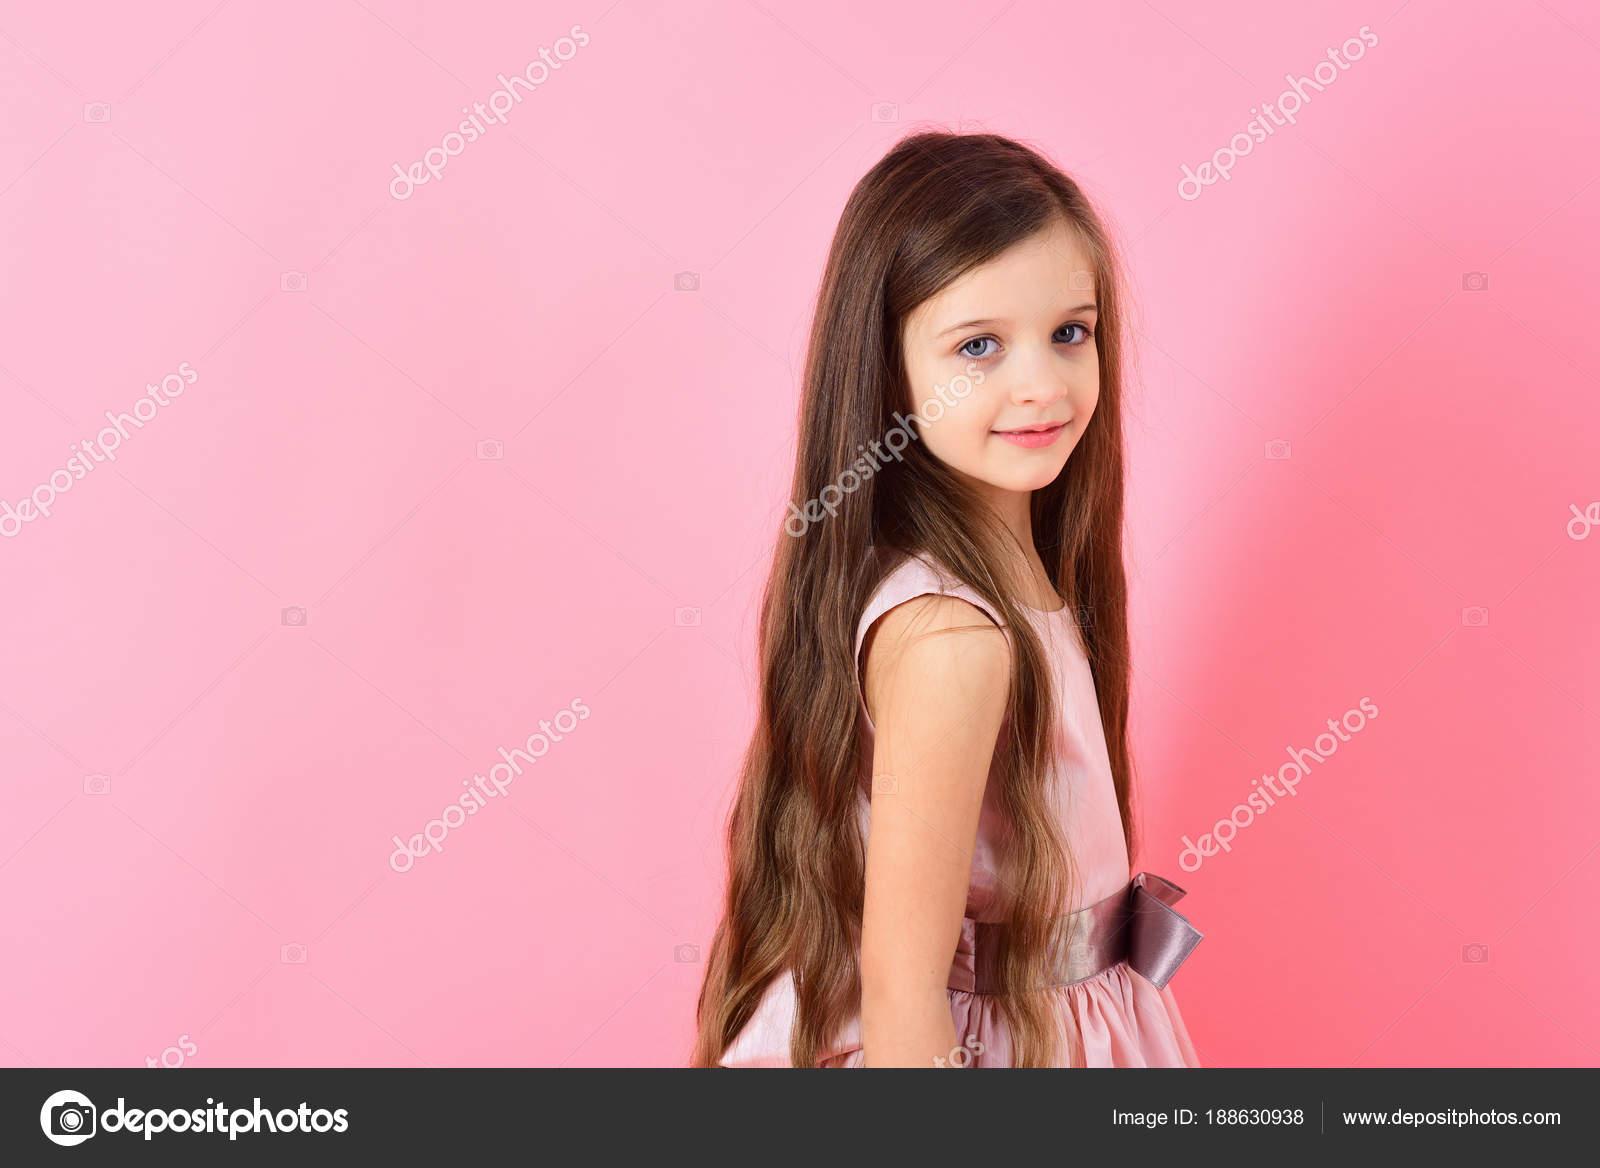 Childhood Look Happiness Hairstyle Stock Photo Tverdohlib